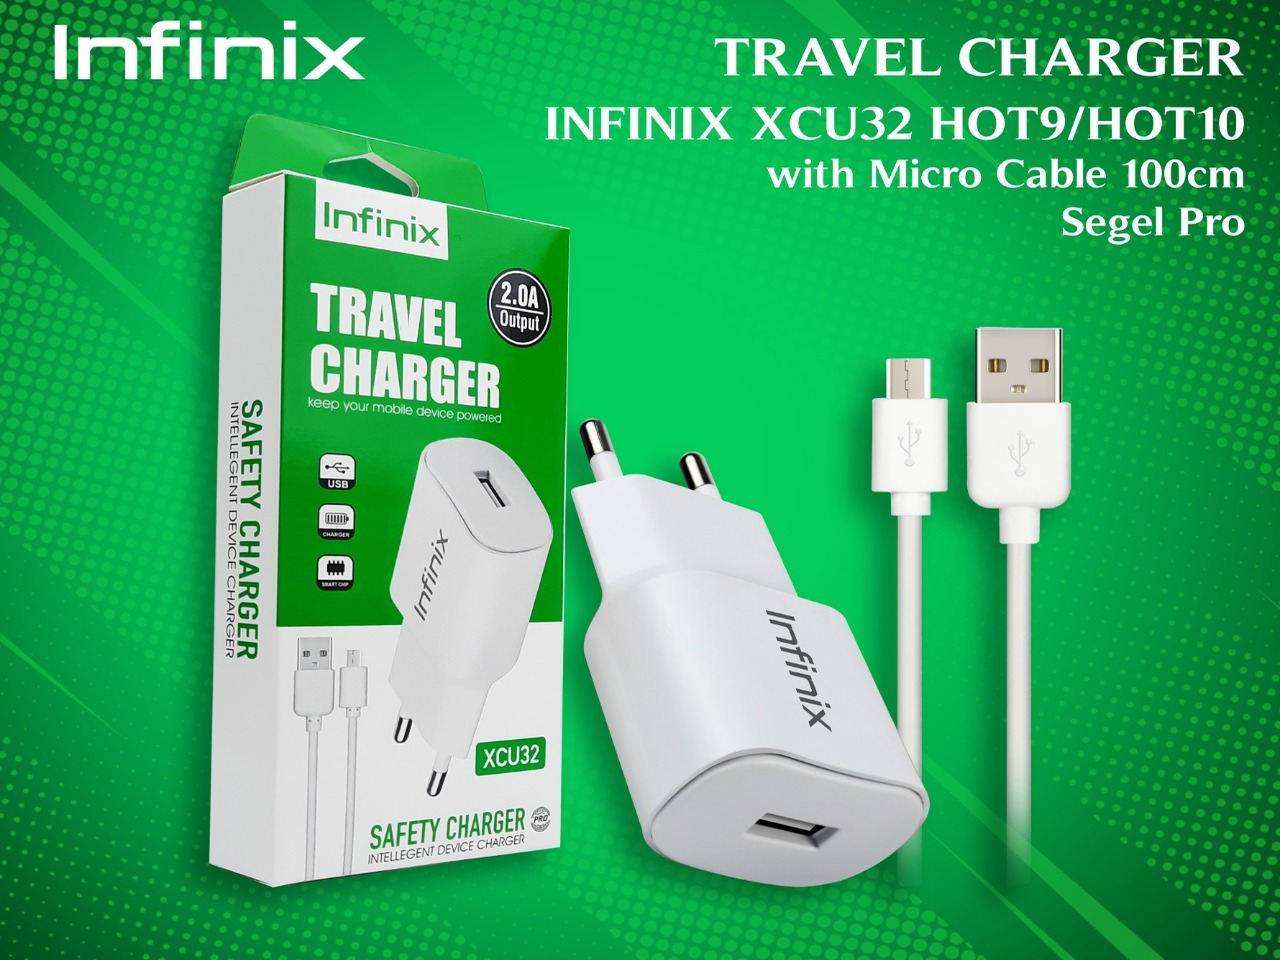 CHARGER-INFINIX-HOT-9-MICRO-XCU32